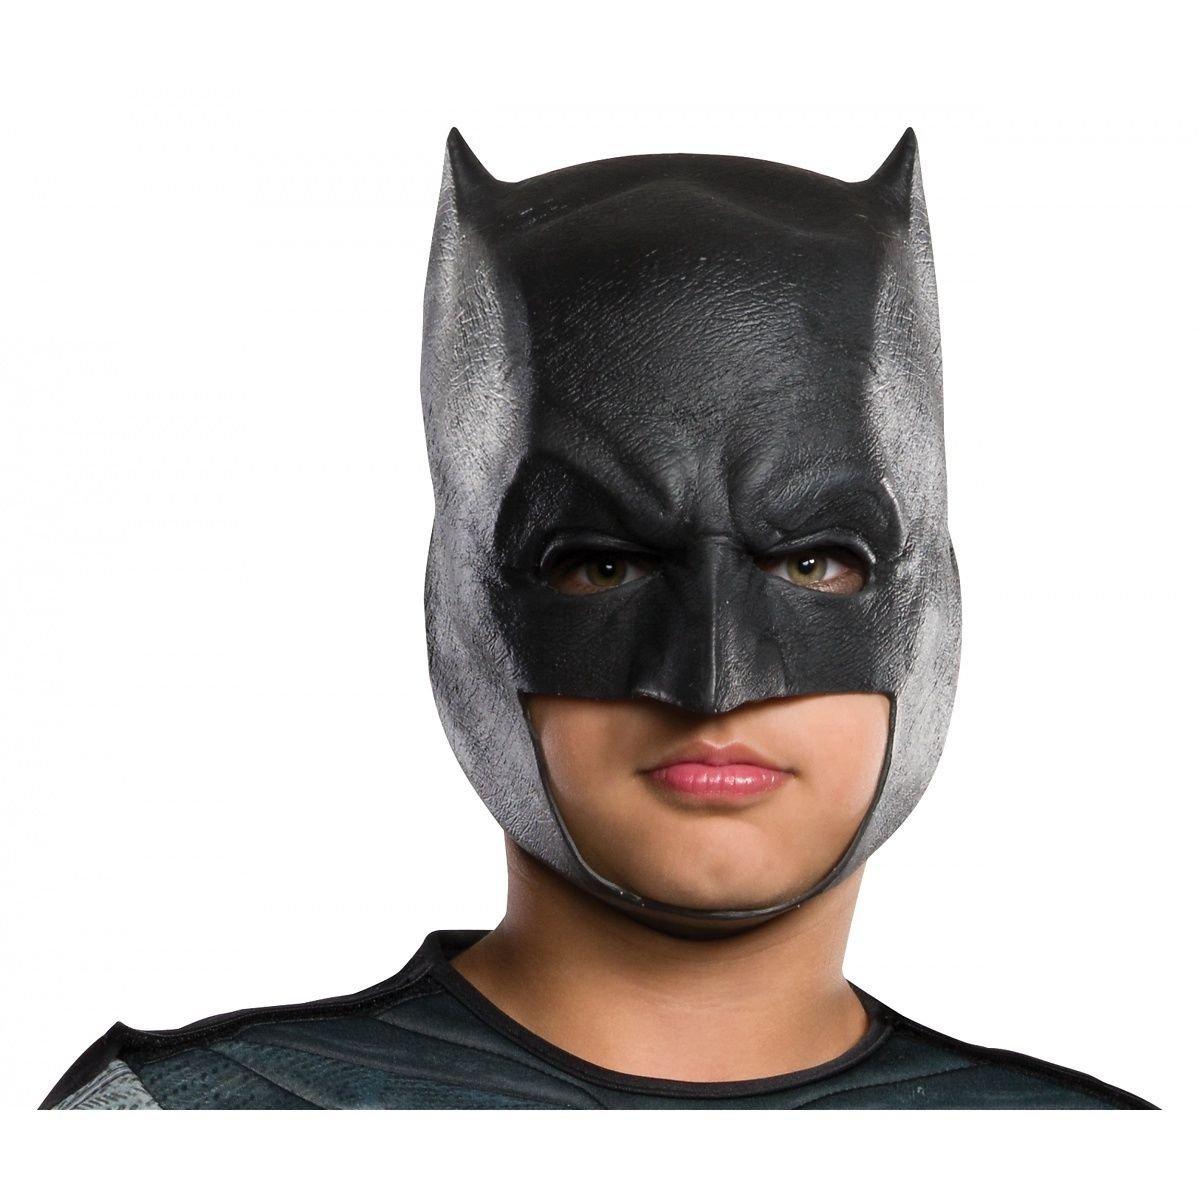 402264fea Get Quotations · Batman Mask Kids Batman v Superman Halloween Costume Fancy  Dress